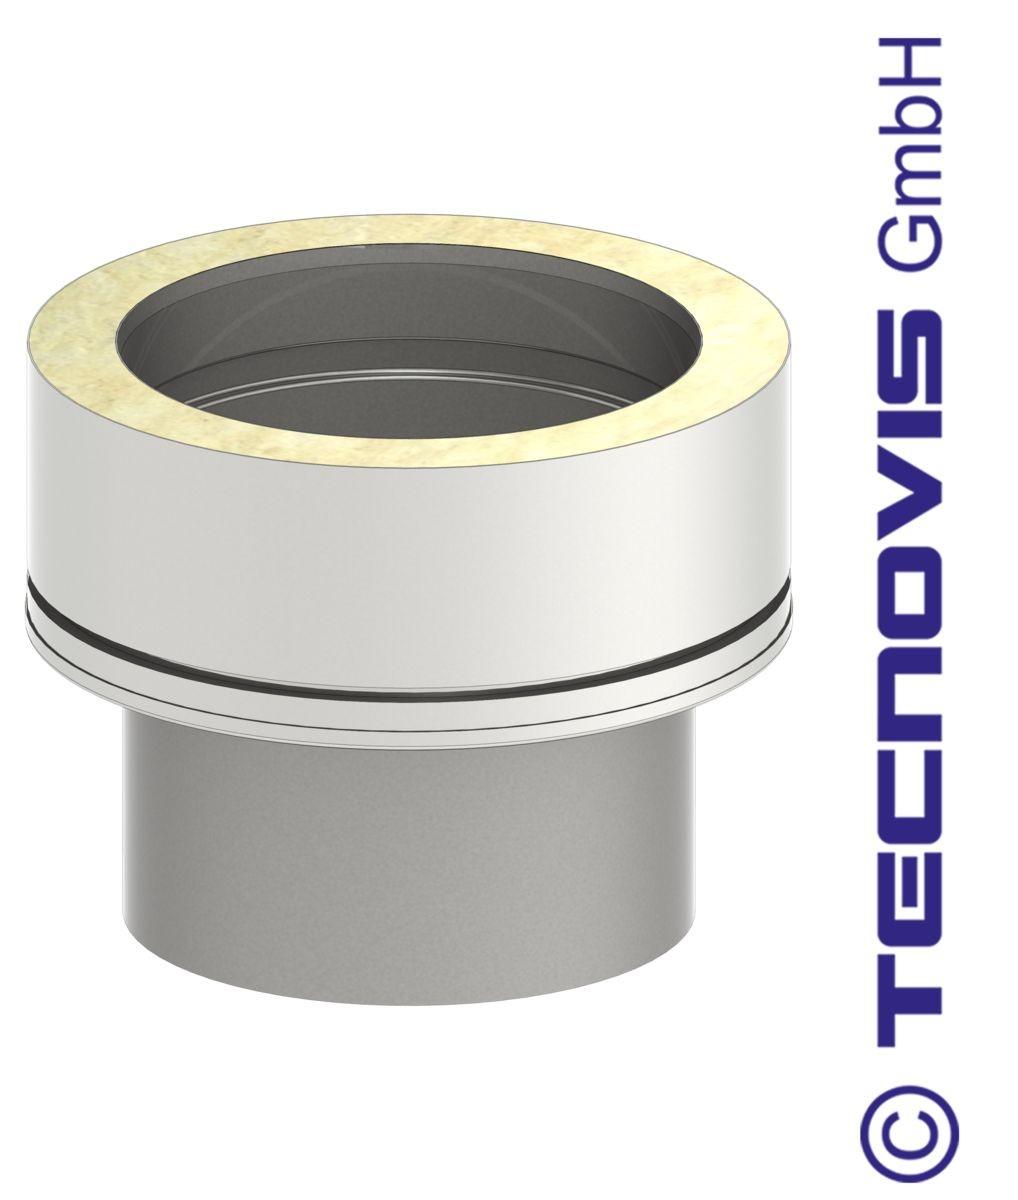 Adaptateur INOX simple - double paroi 130 mm